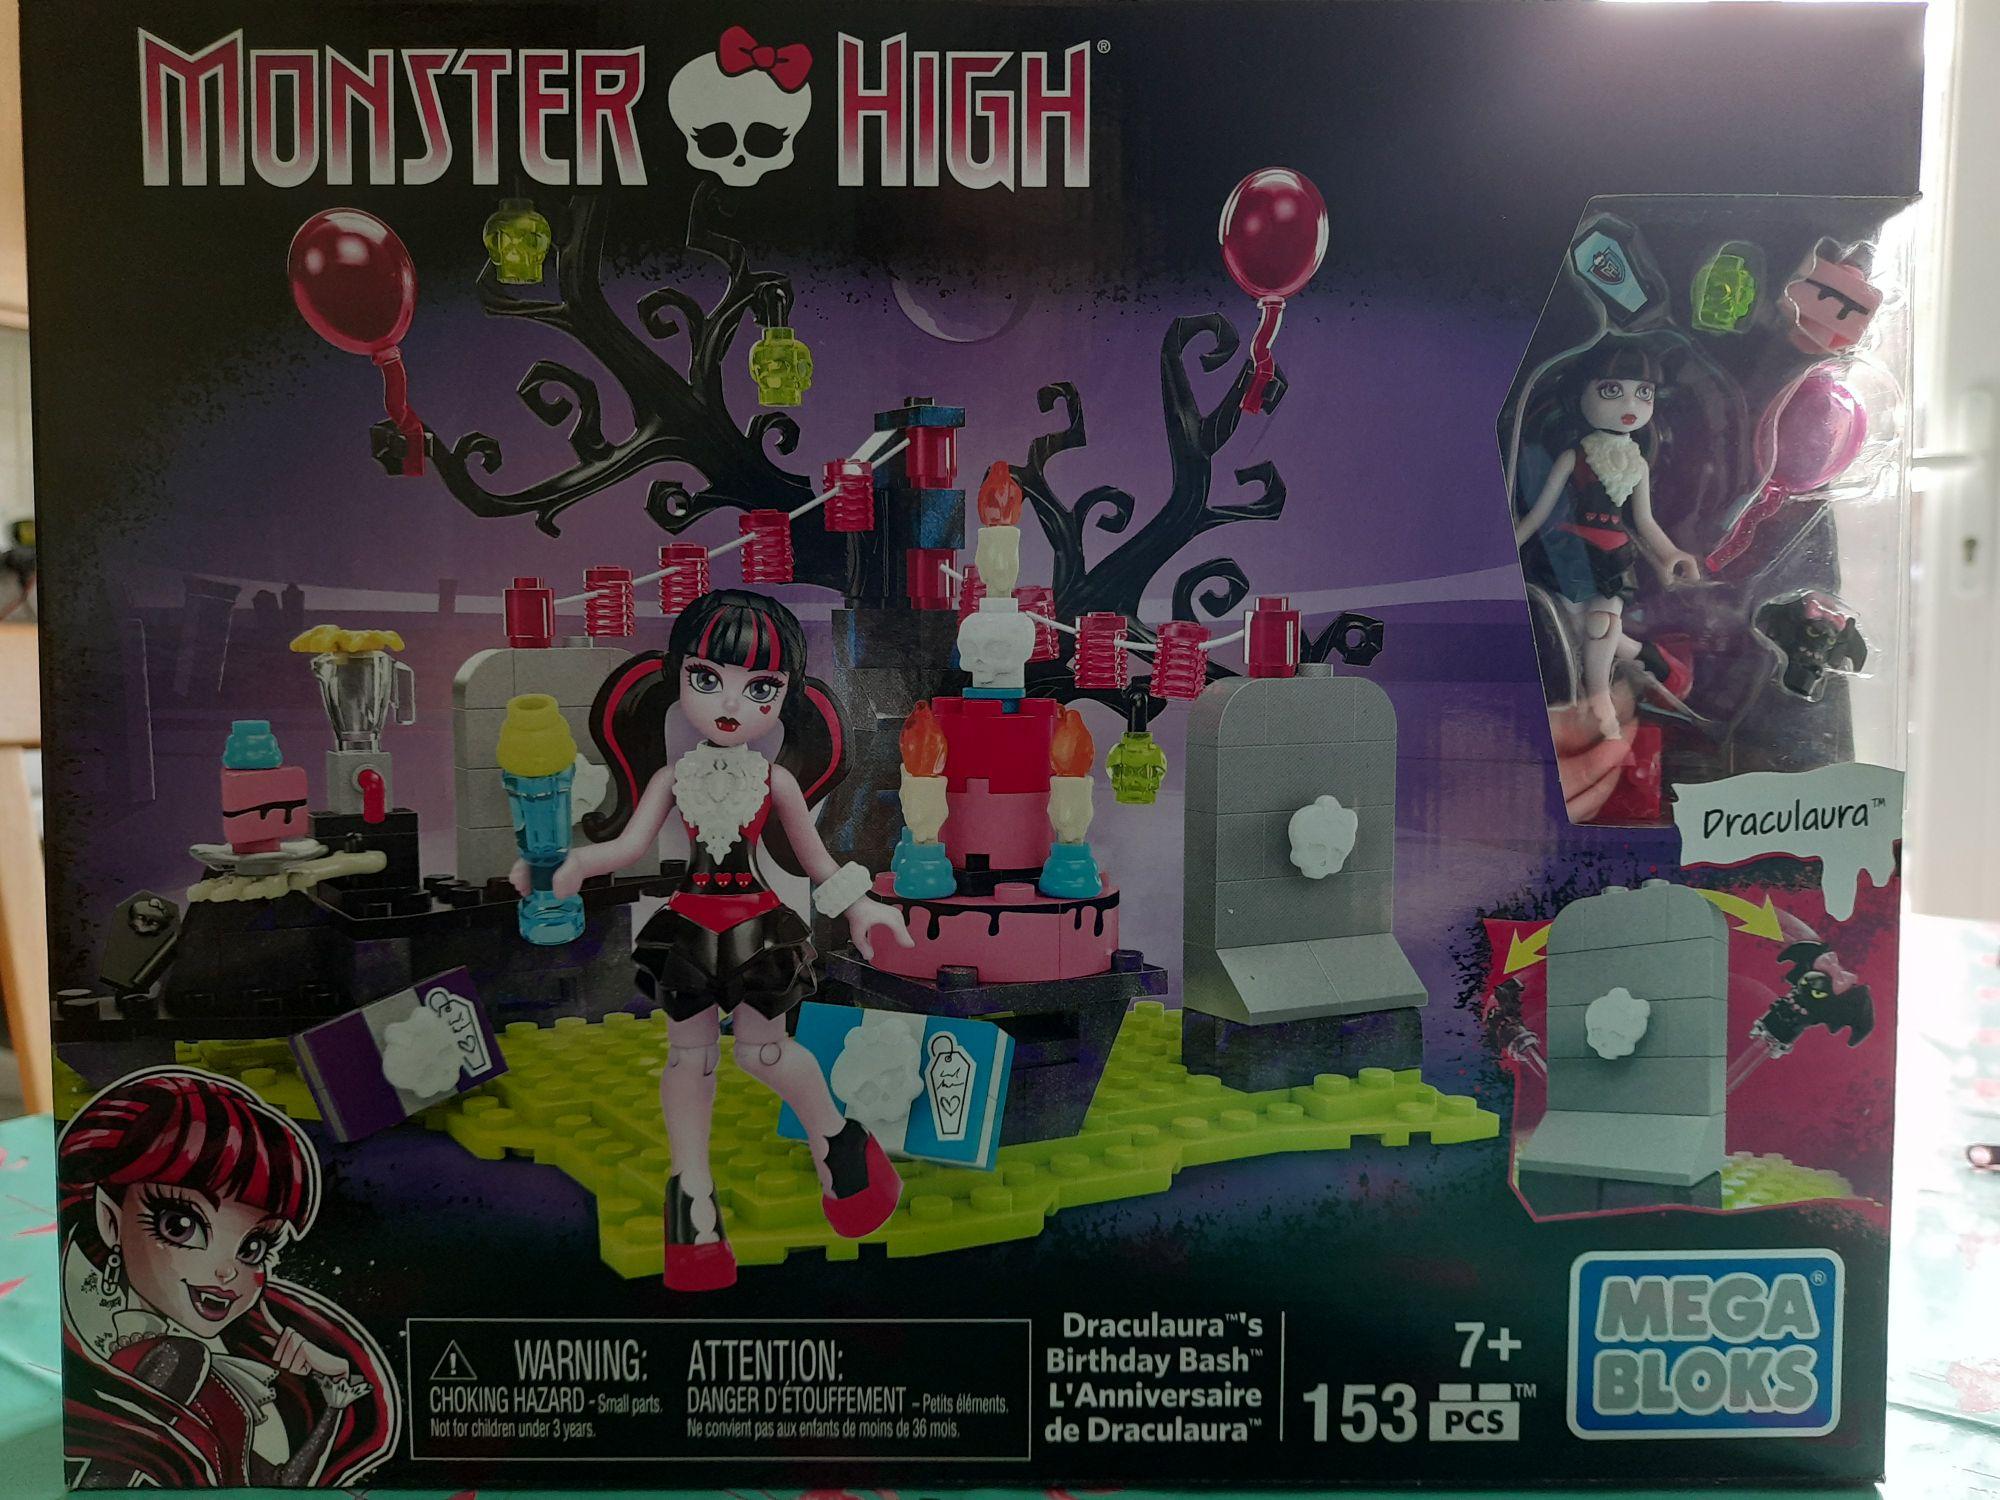 Mega Bloks - Monster High Draculaura's Birthday Bash set (153pcs) £0.99 Home Bargains Stafford